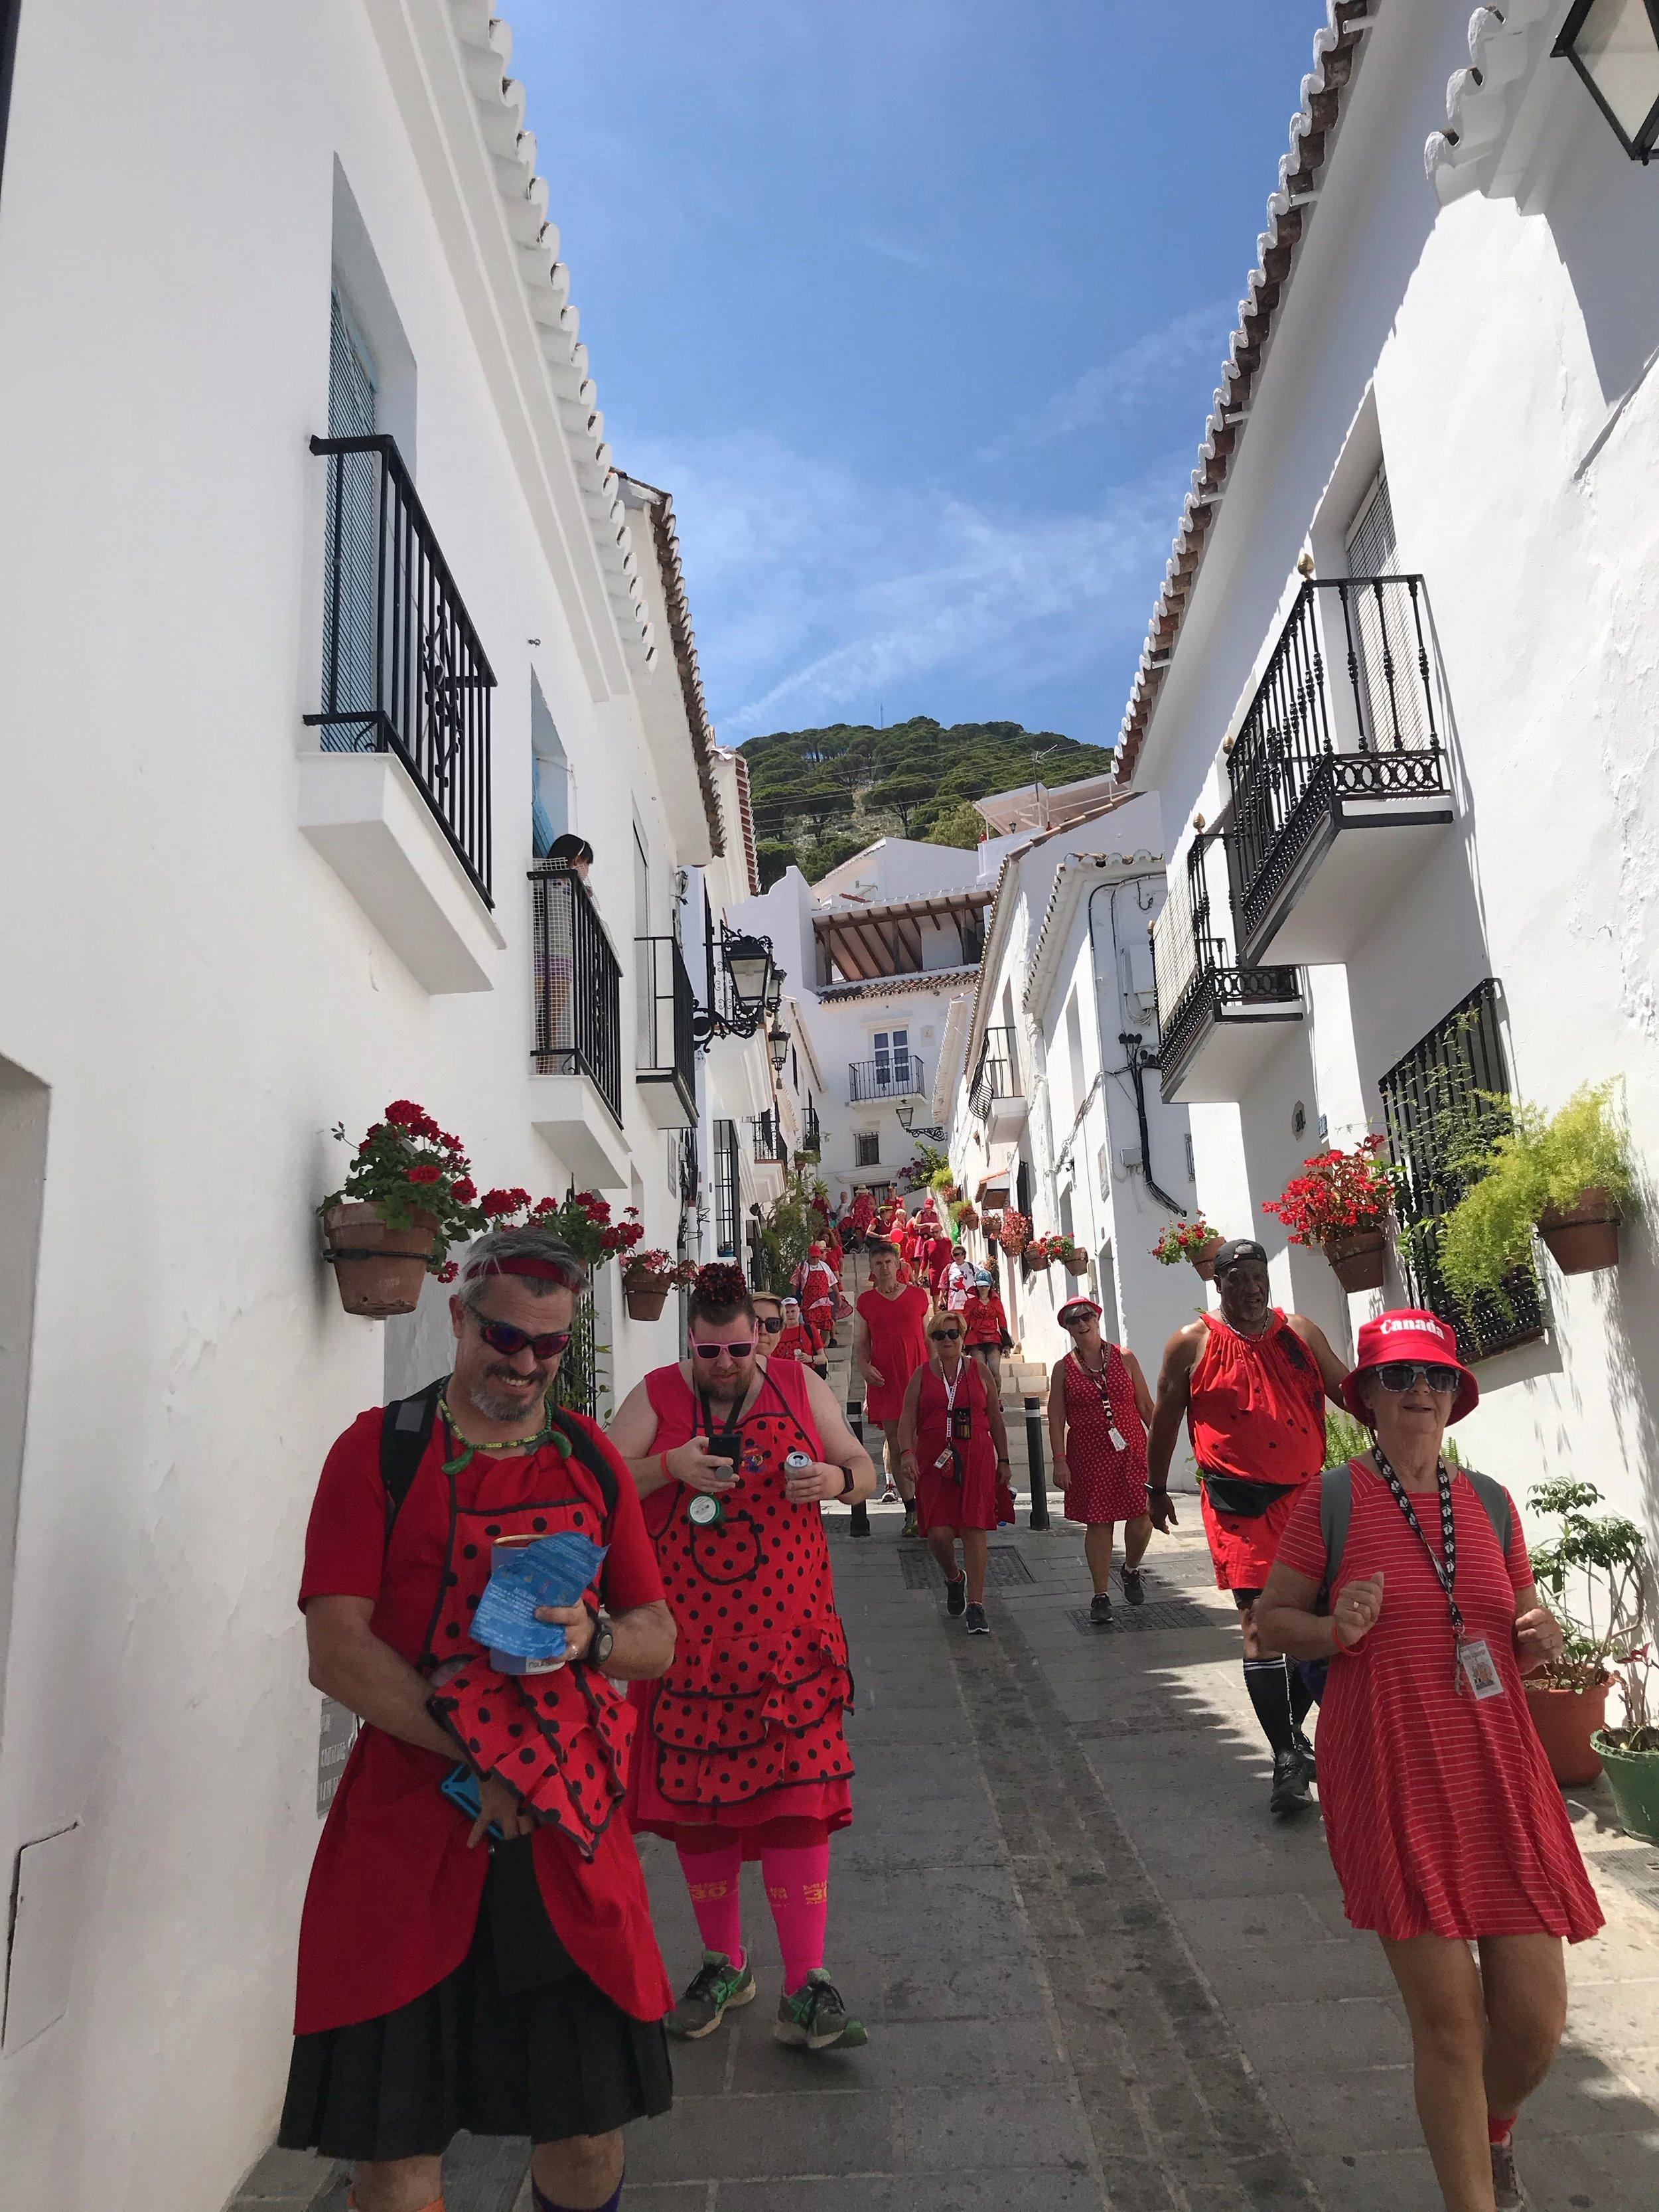 Mijas H3 - Hash Flash Red Hot Chili - 30th Ann. Red Dress Run 1631  - 16 May 2019 - Photo17.jpg